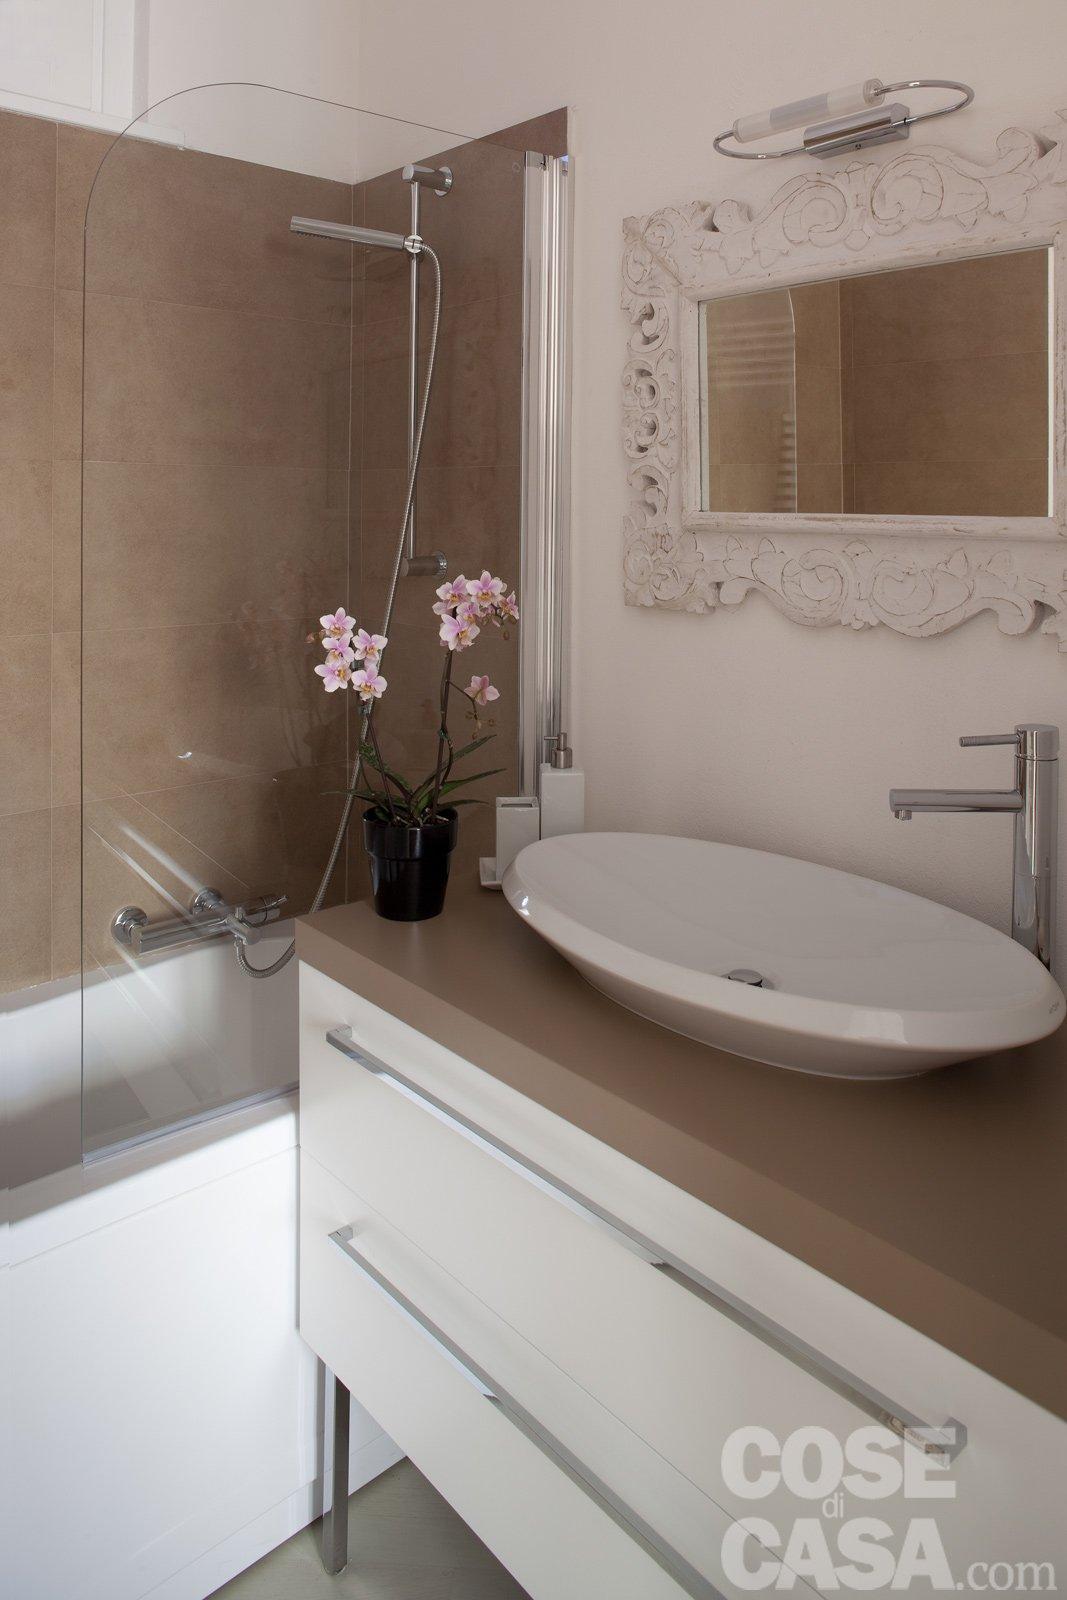 Idee mobili bagno fai da te : idee mobili bagno fai da te. idee ...